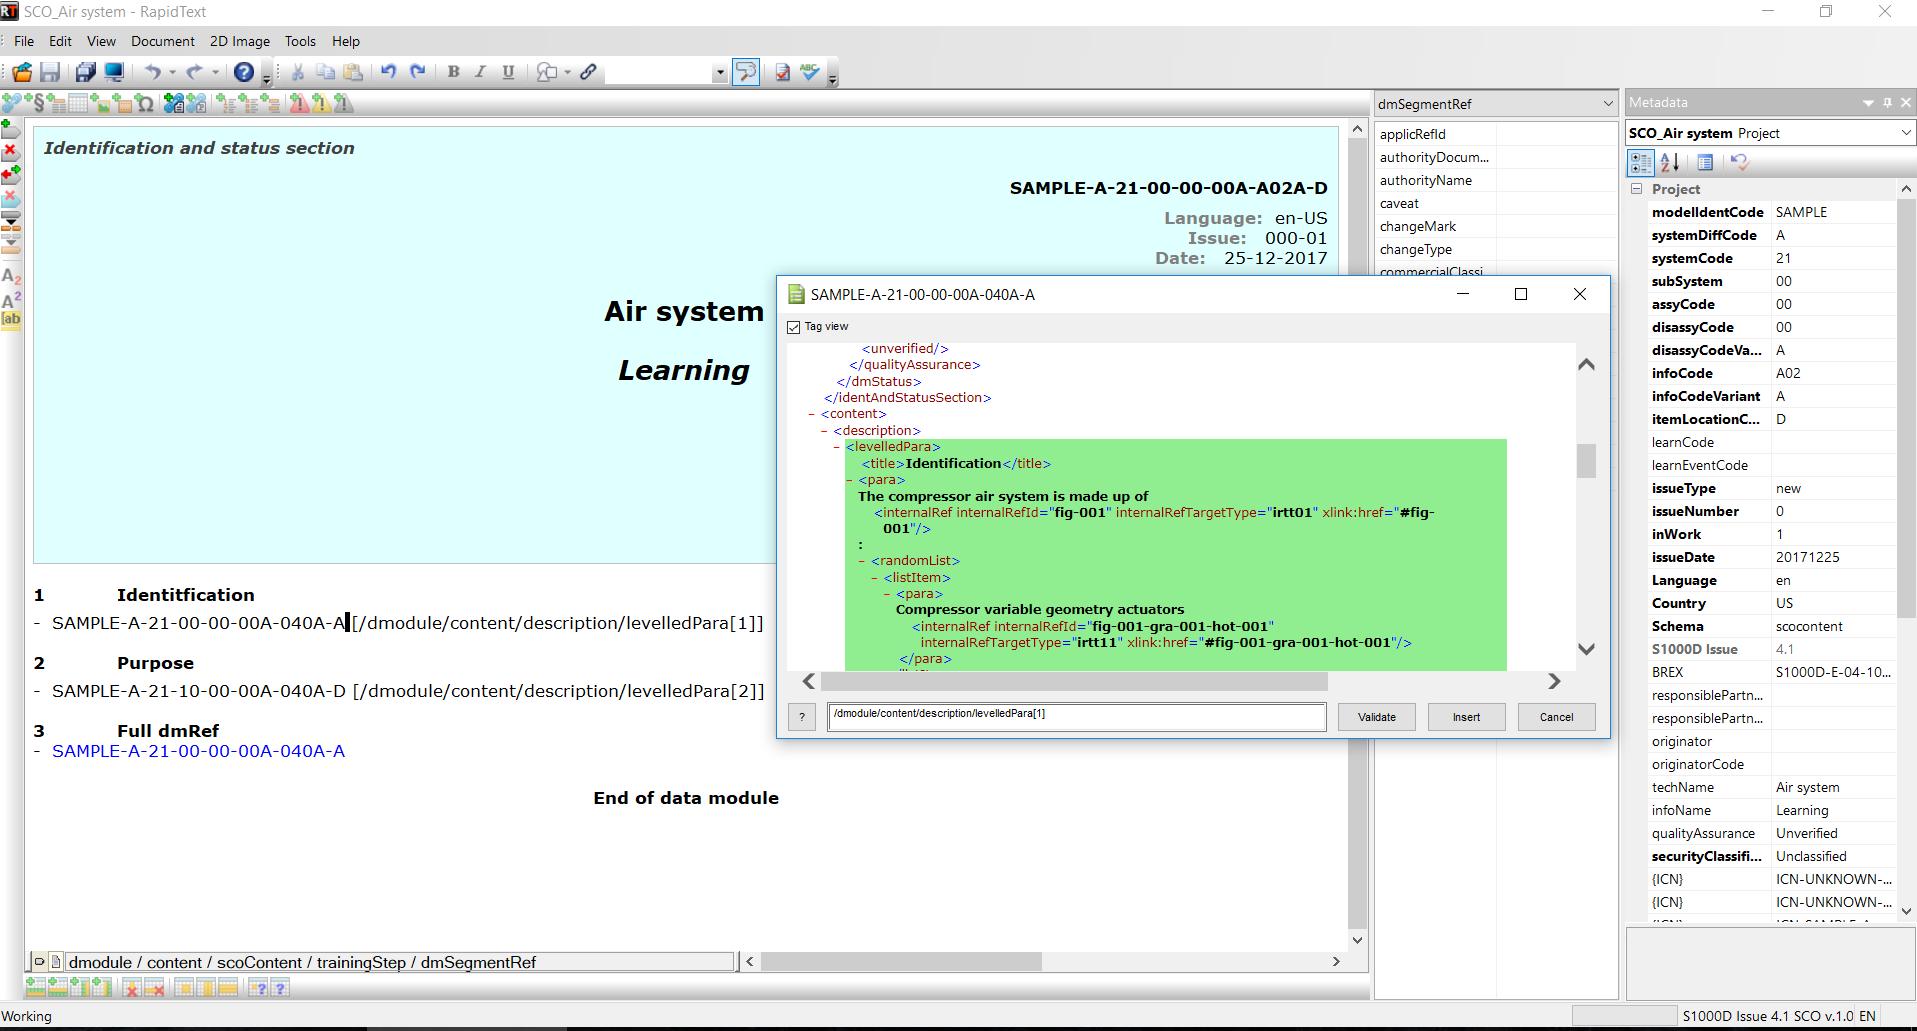 TechnicalPublishing-ActiveWorkspace_1.png